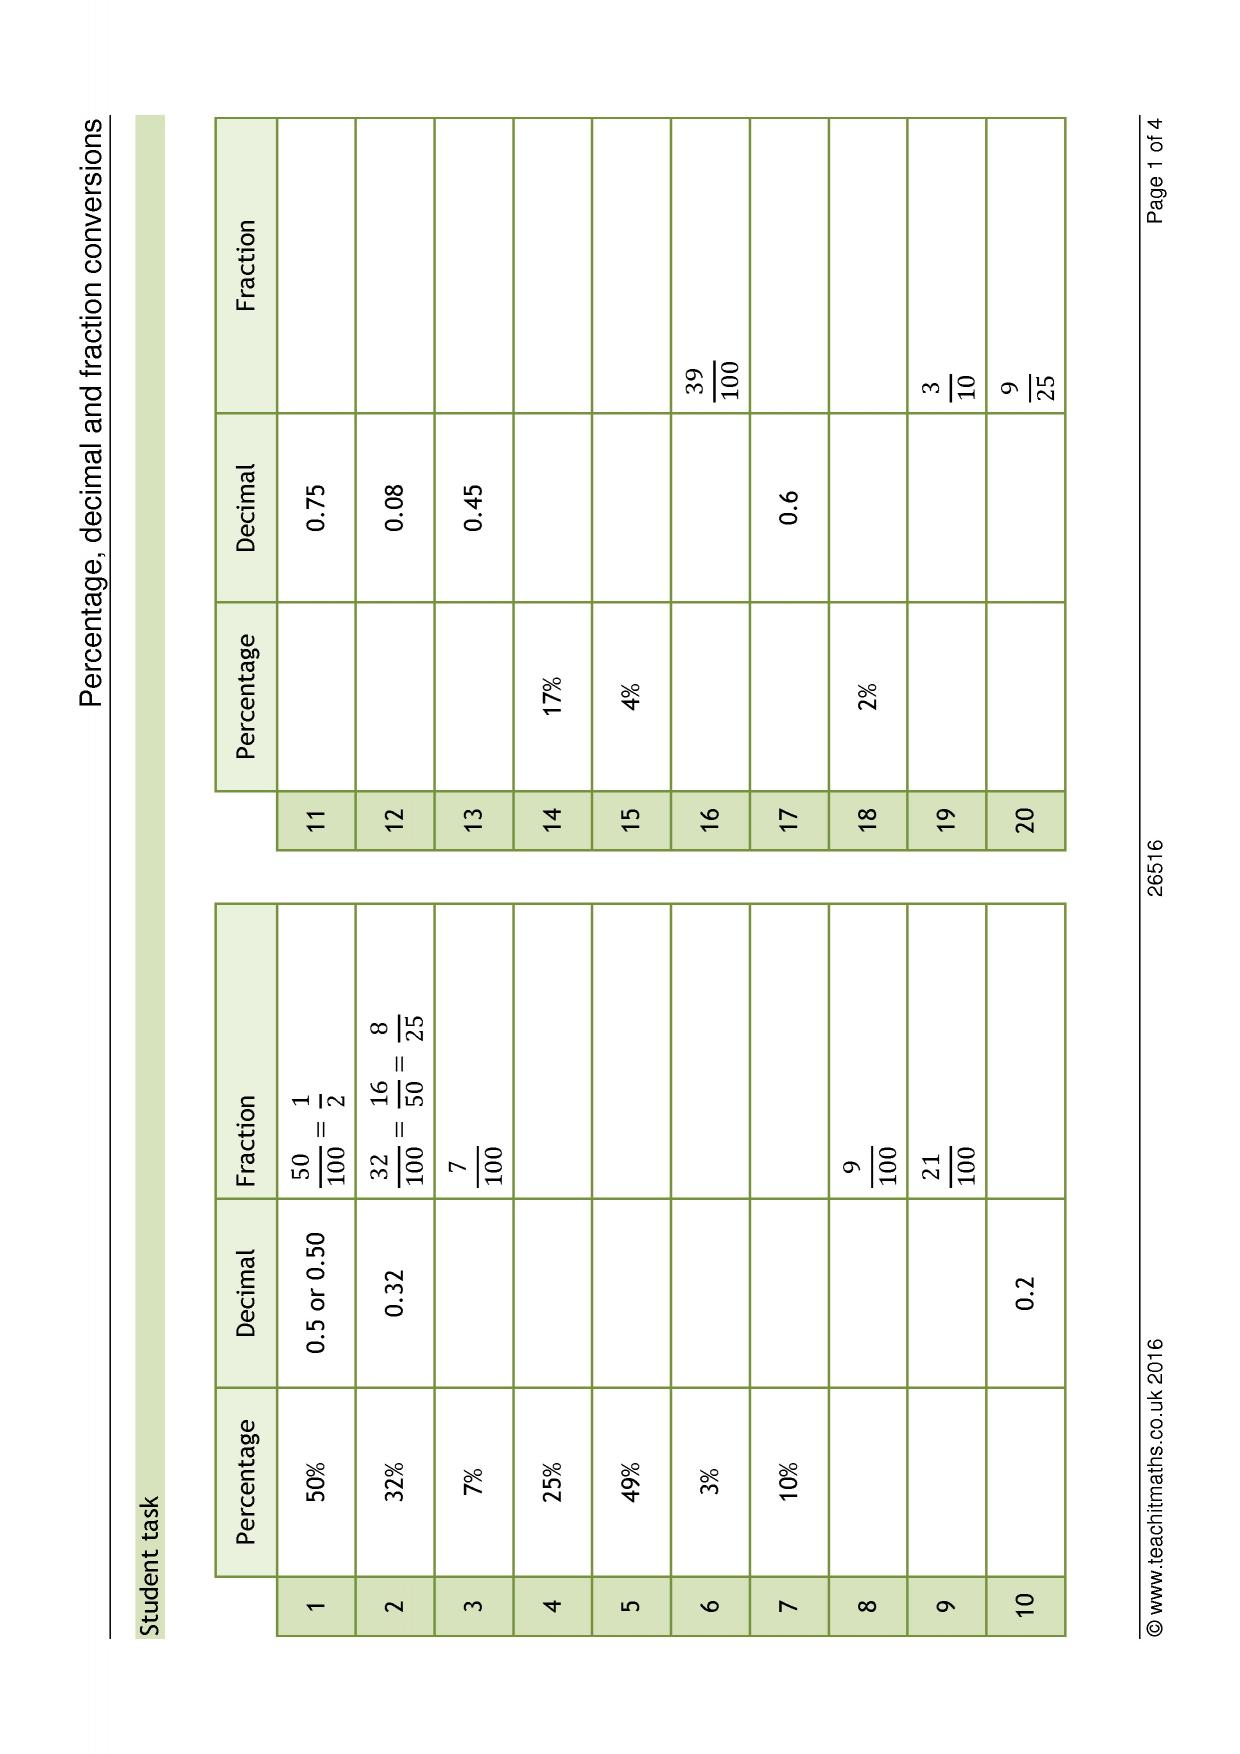 ks3 fractions decimals percentages teachit maths. Black Bedroom Furniture Sets. Home Design Ideas